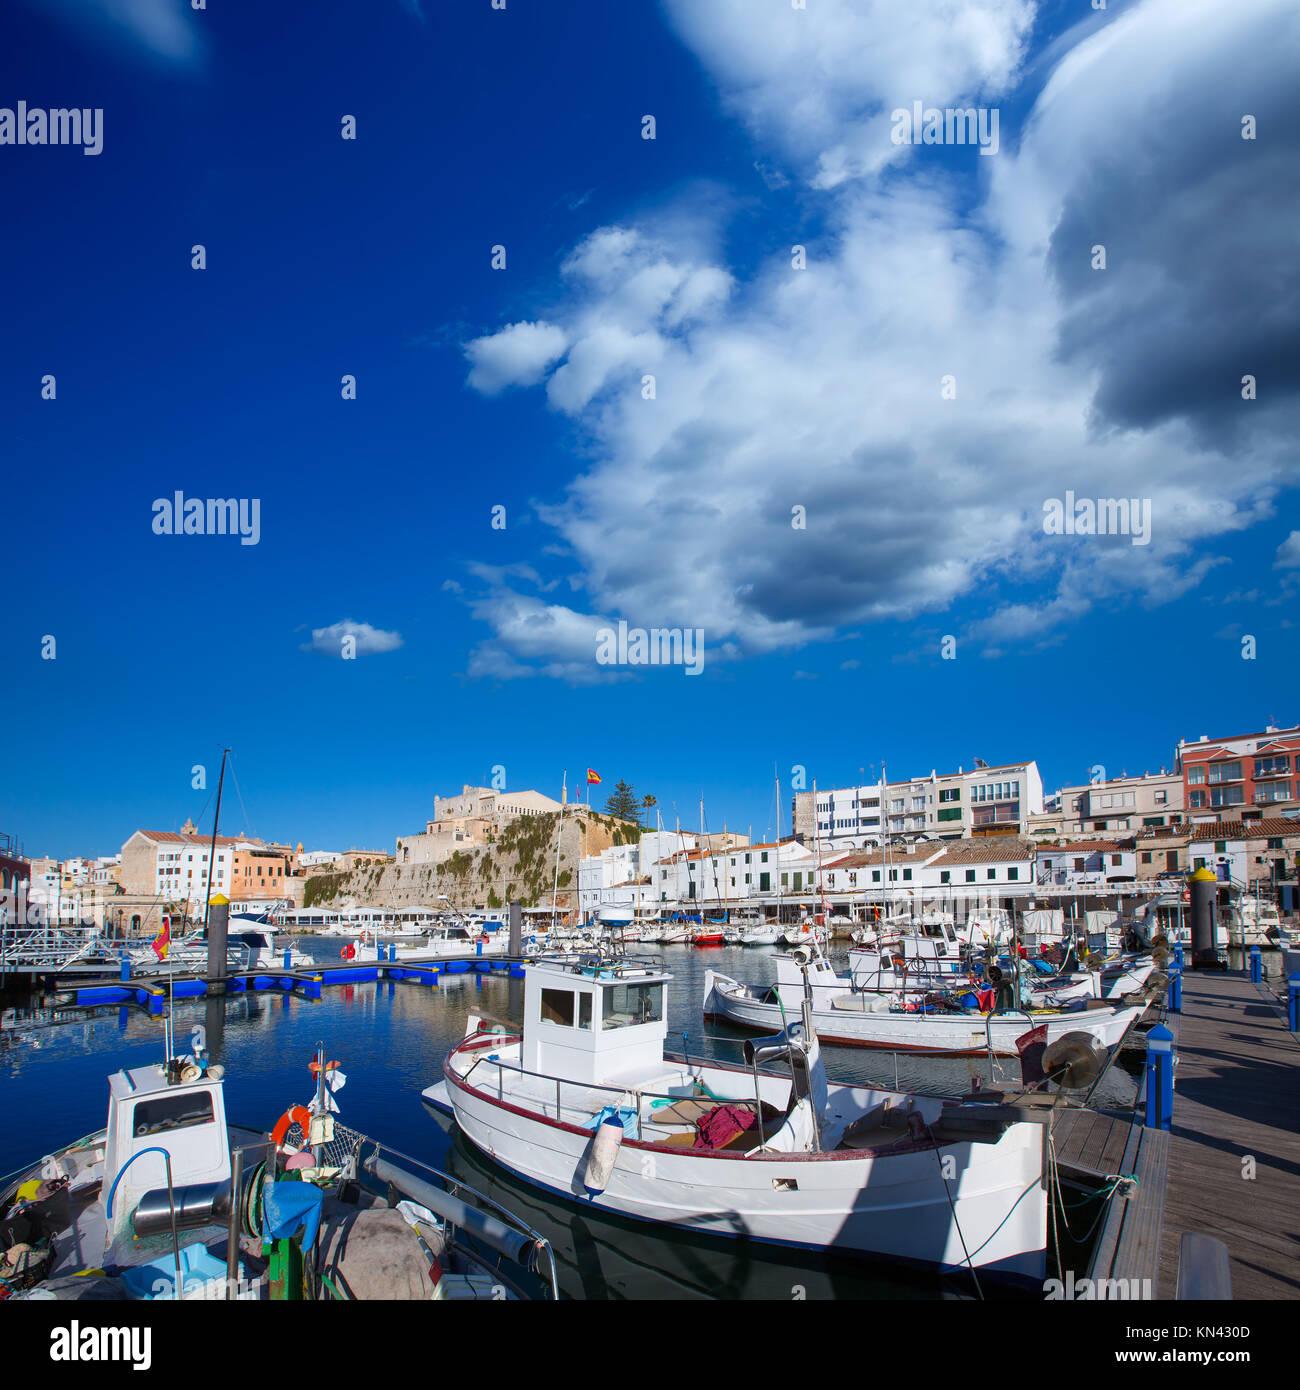 Ciutadella Menorca marina Port view and Ayuntamiento Town hall Balearic Islands. - Stock Image